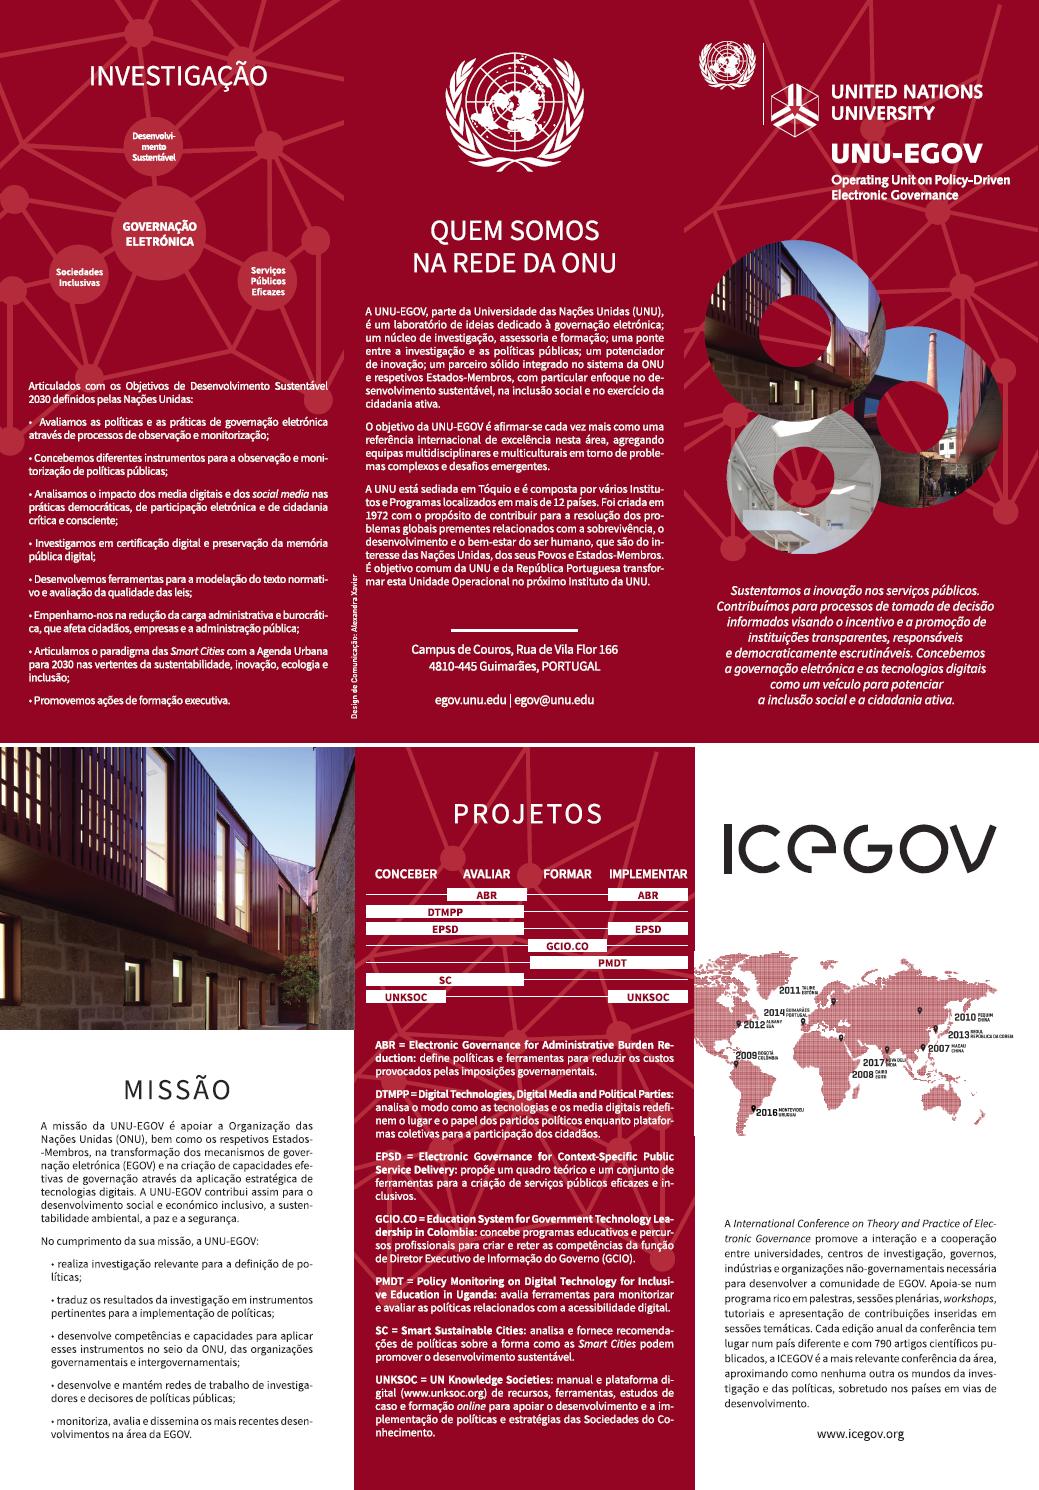 UNU-EGOV Leaflet - Portuguese